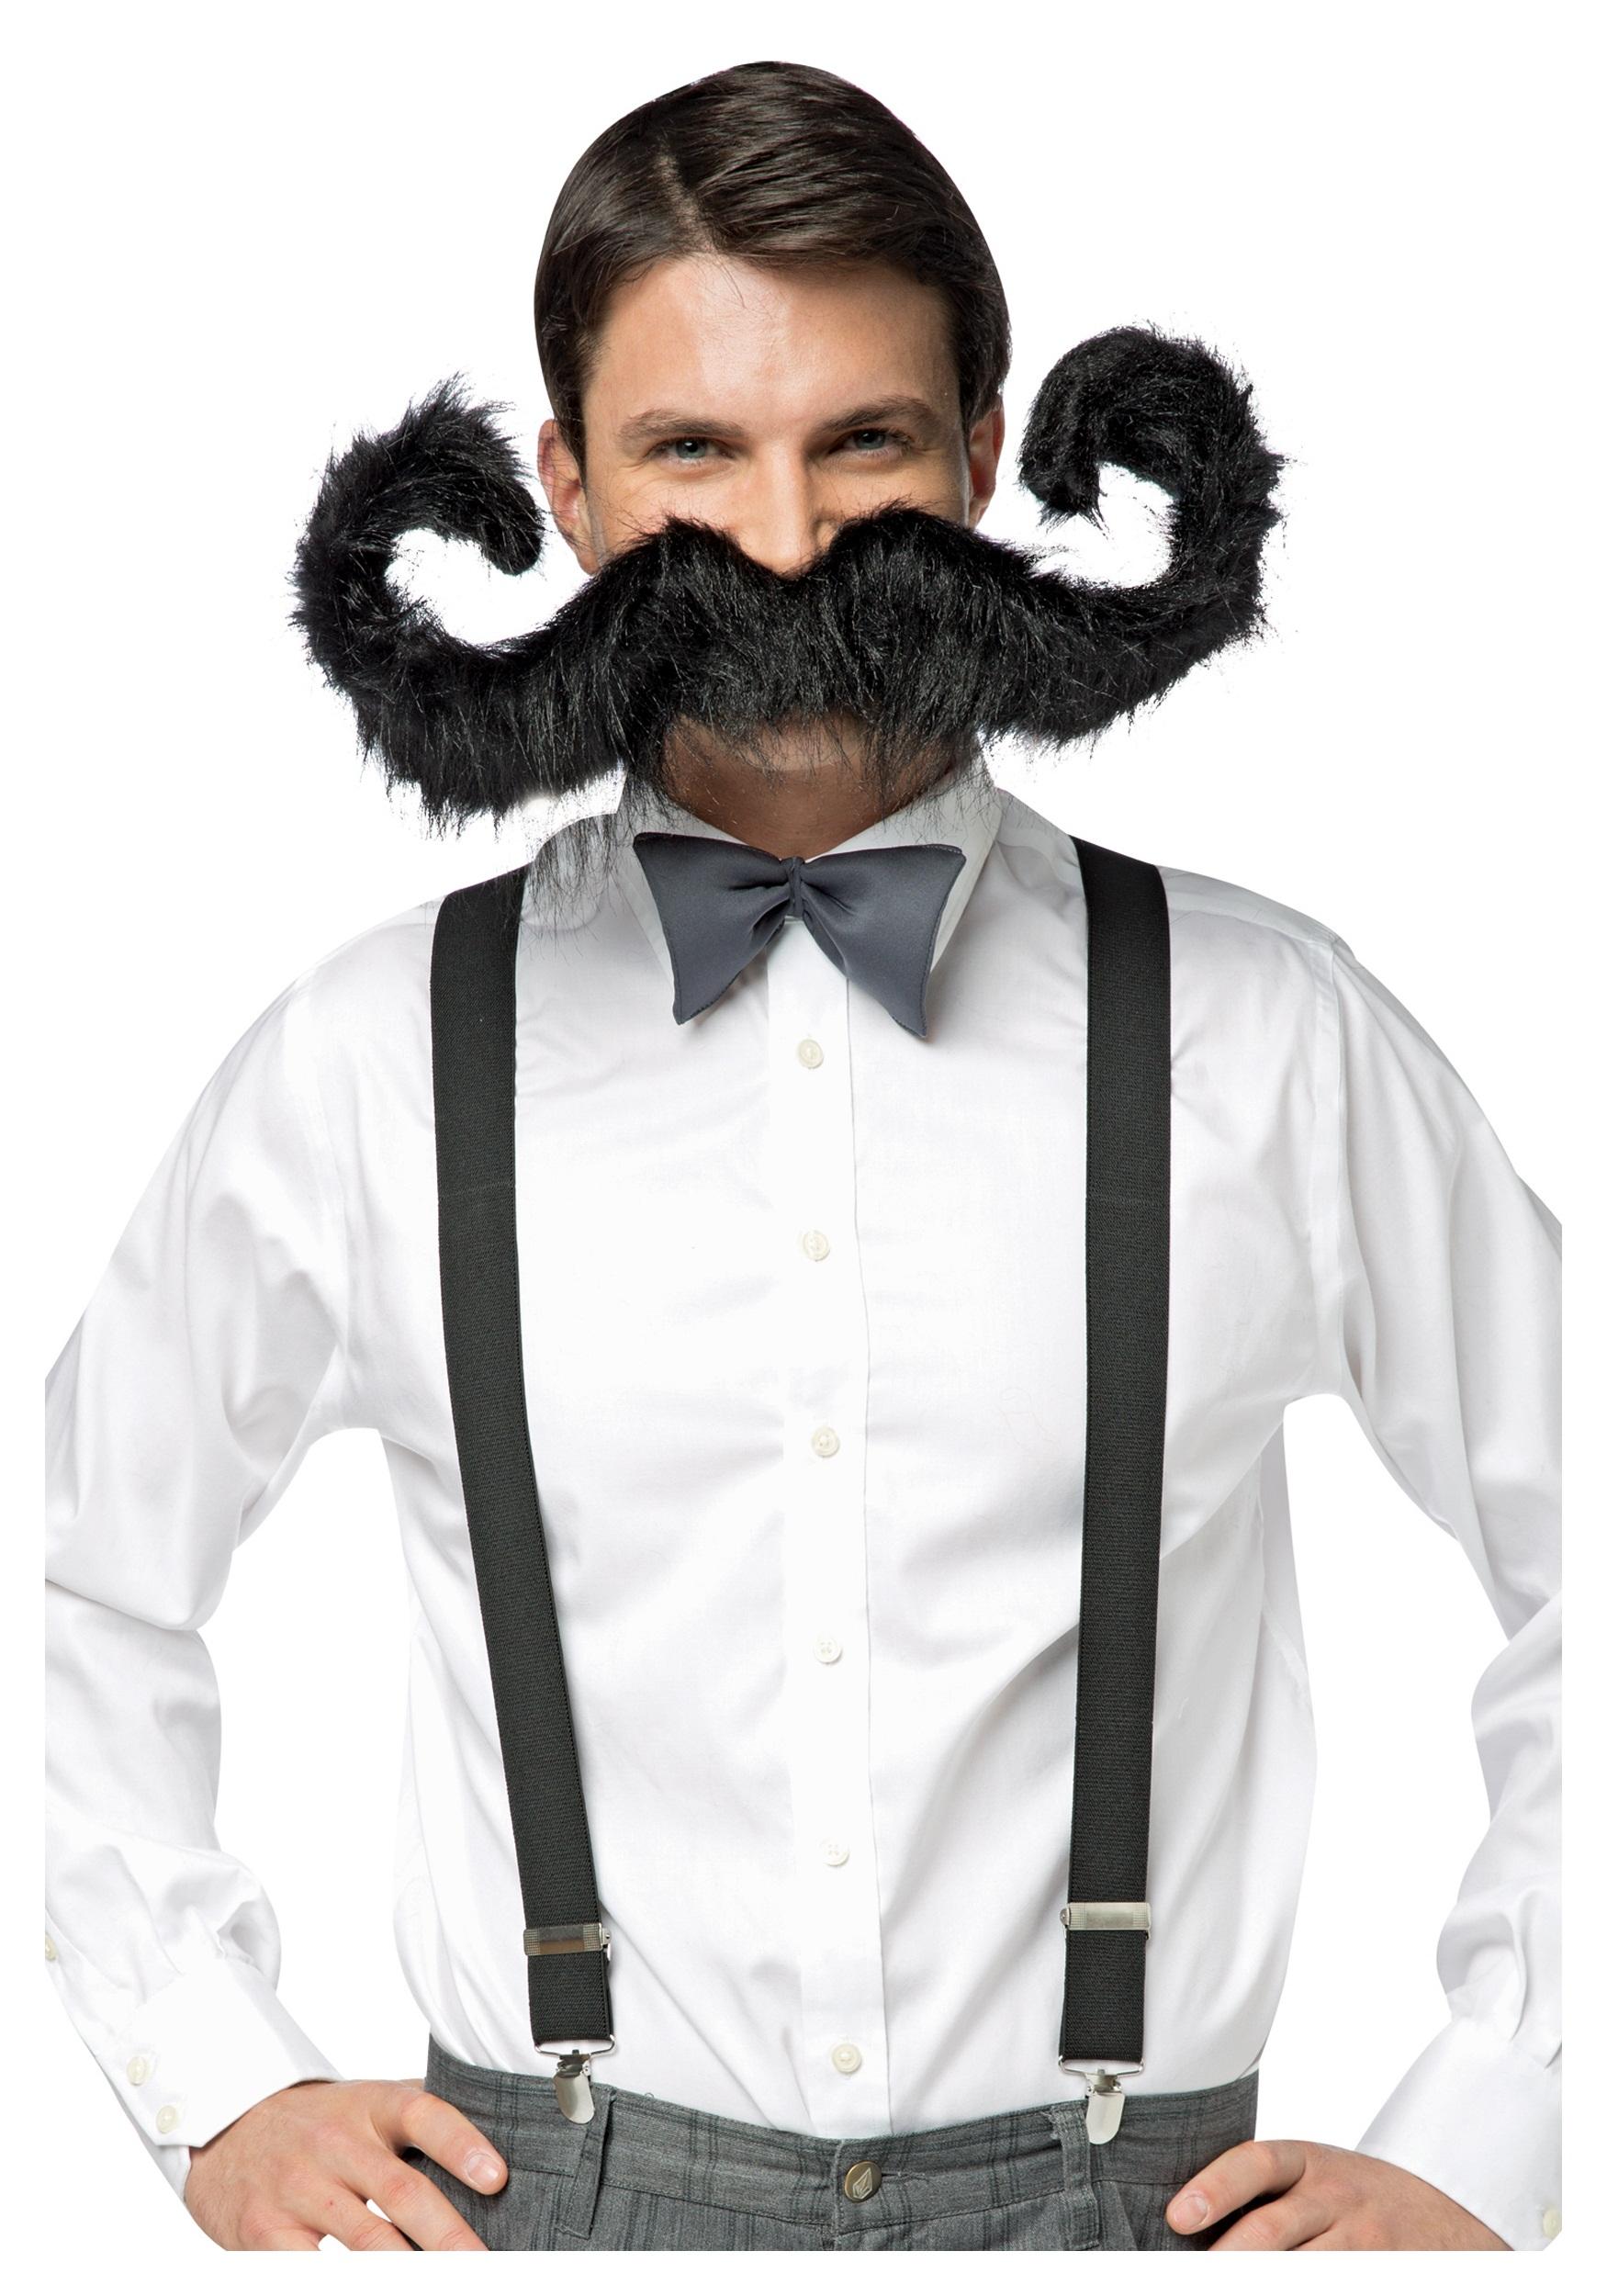 30 Inch Super Mustache  sc 1 st  Halloween Costumes & 30 Inch Super Mustache - Halloween Costumes